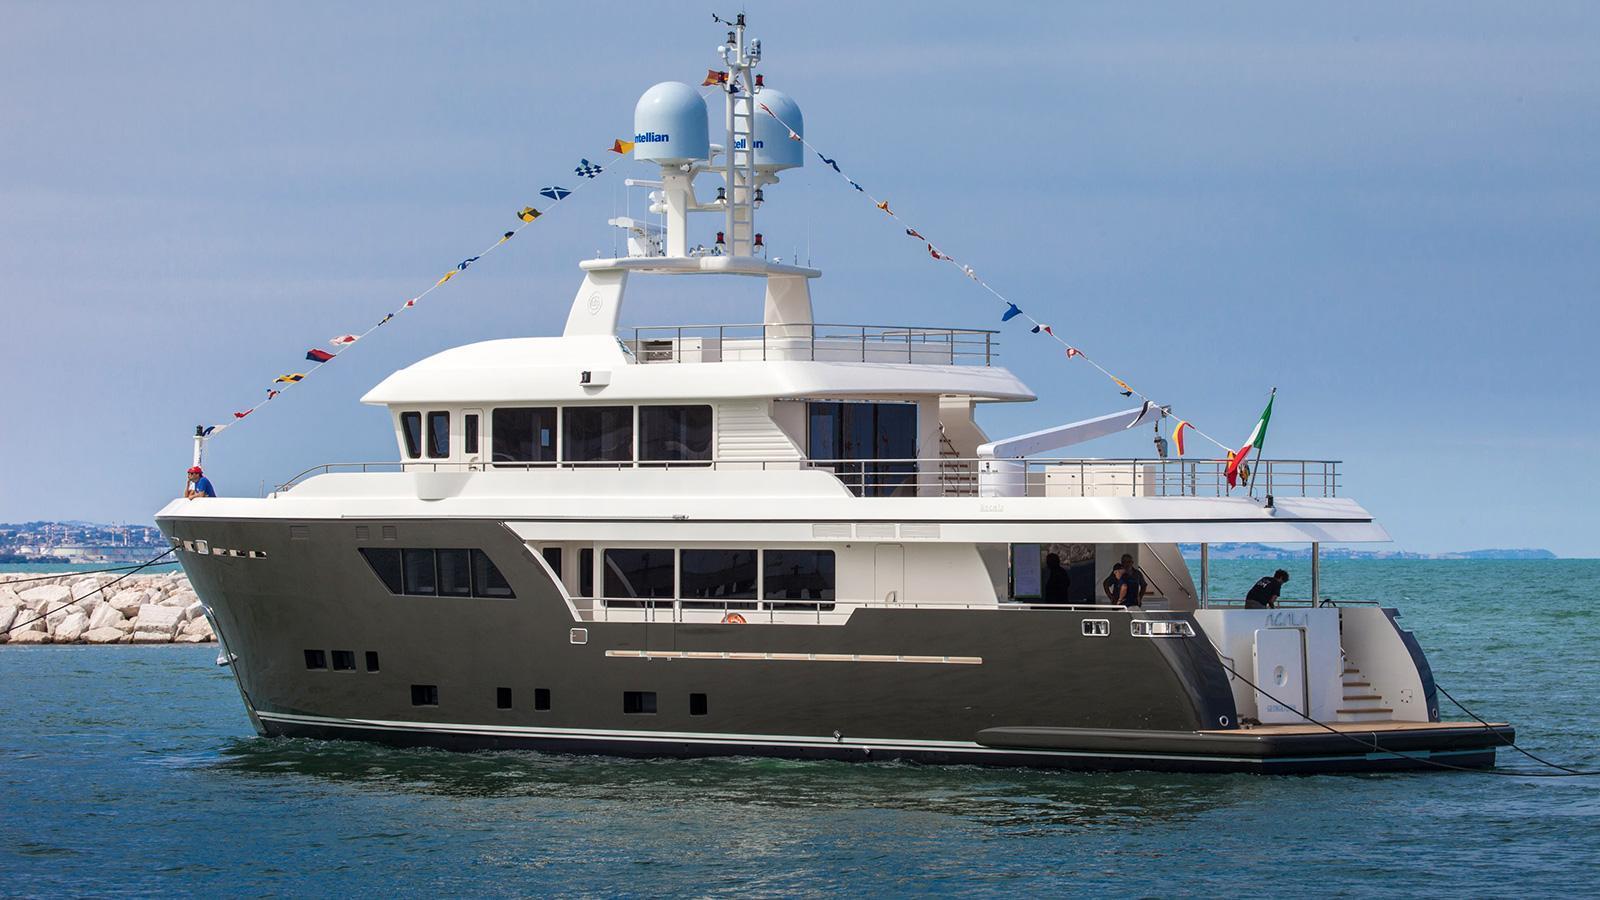 acala-motor-yacht-cantiere-delle-marche-2015-31m-half-profile